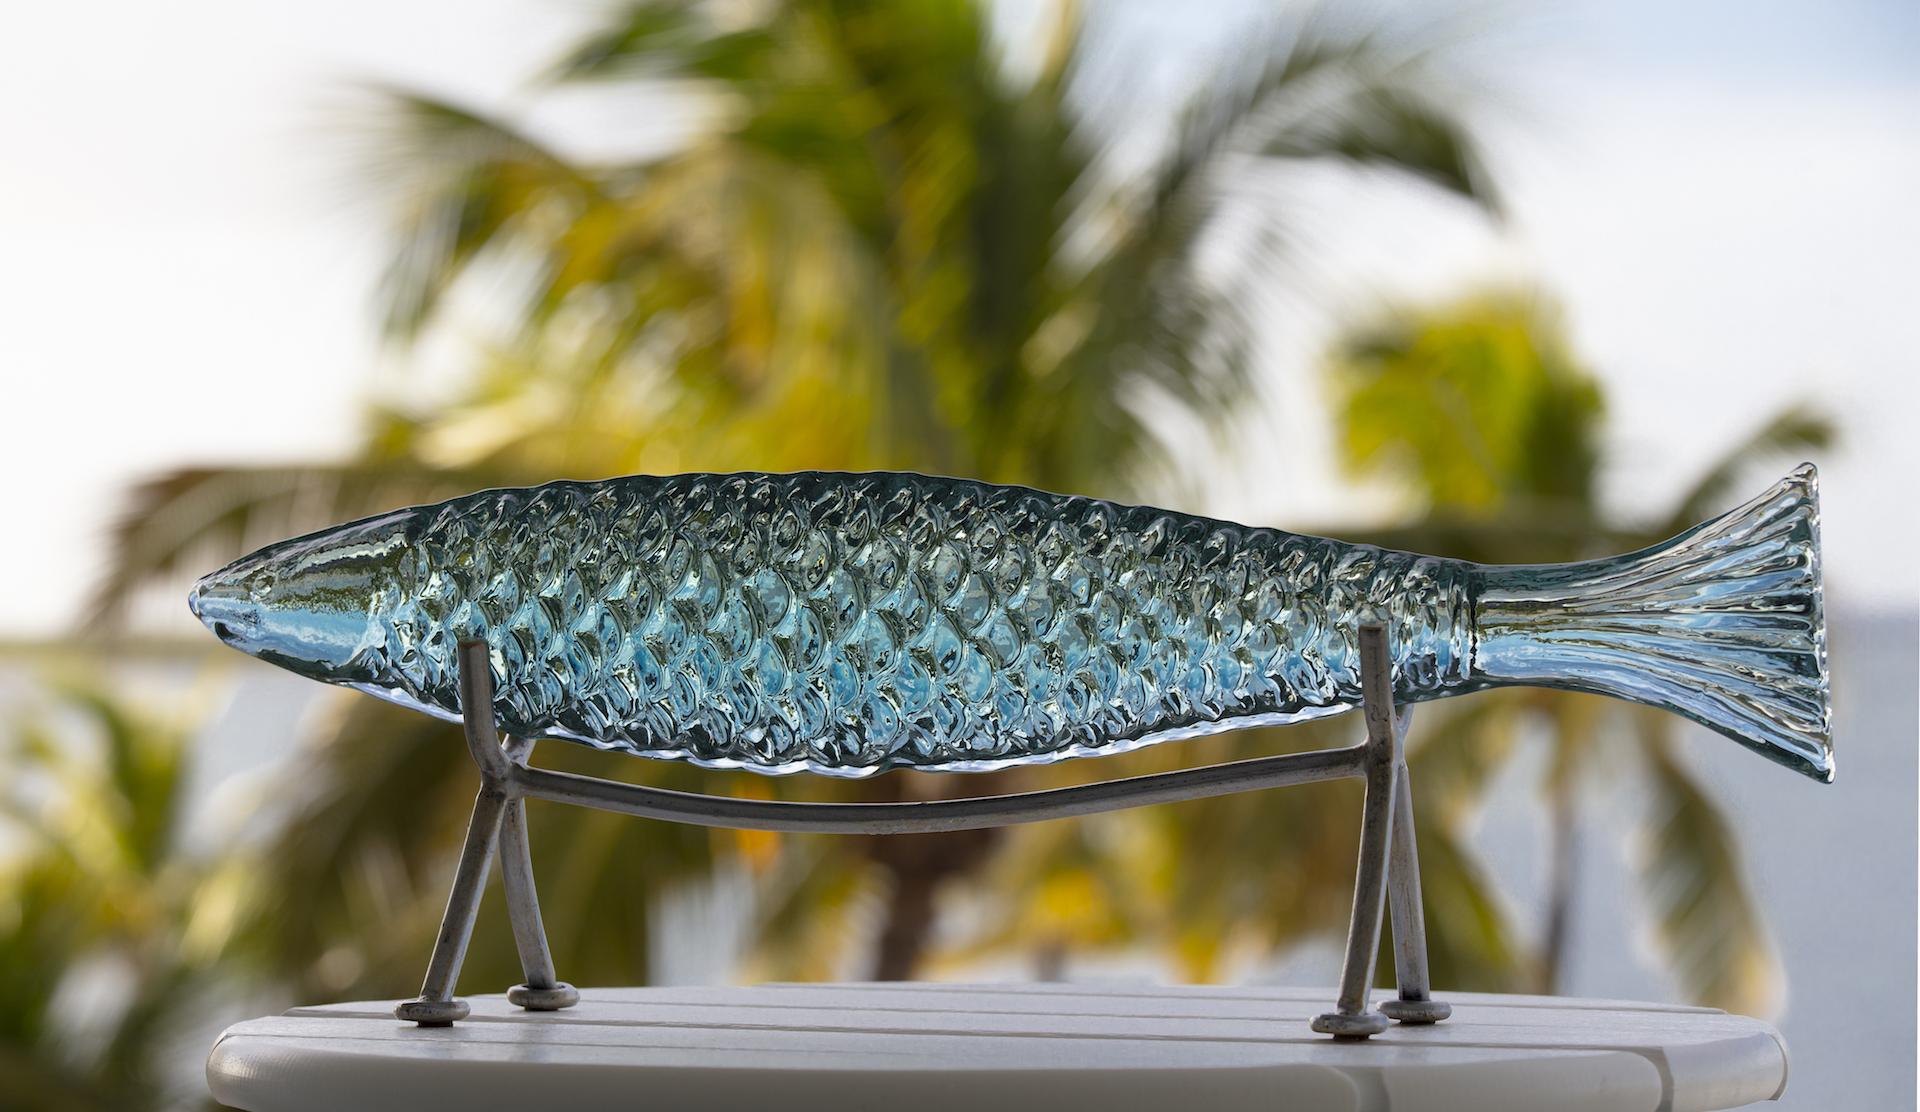 glass fish creative image